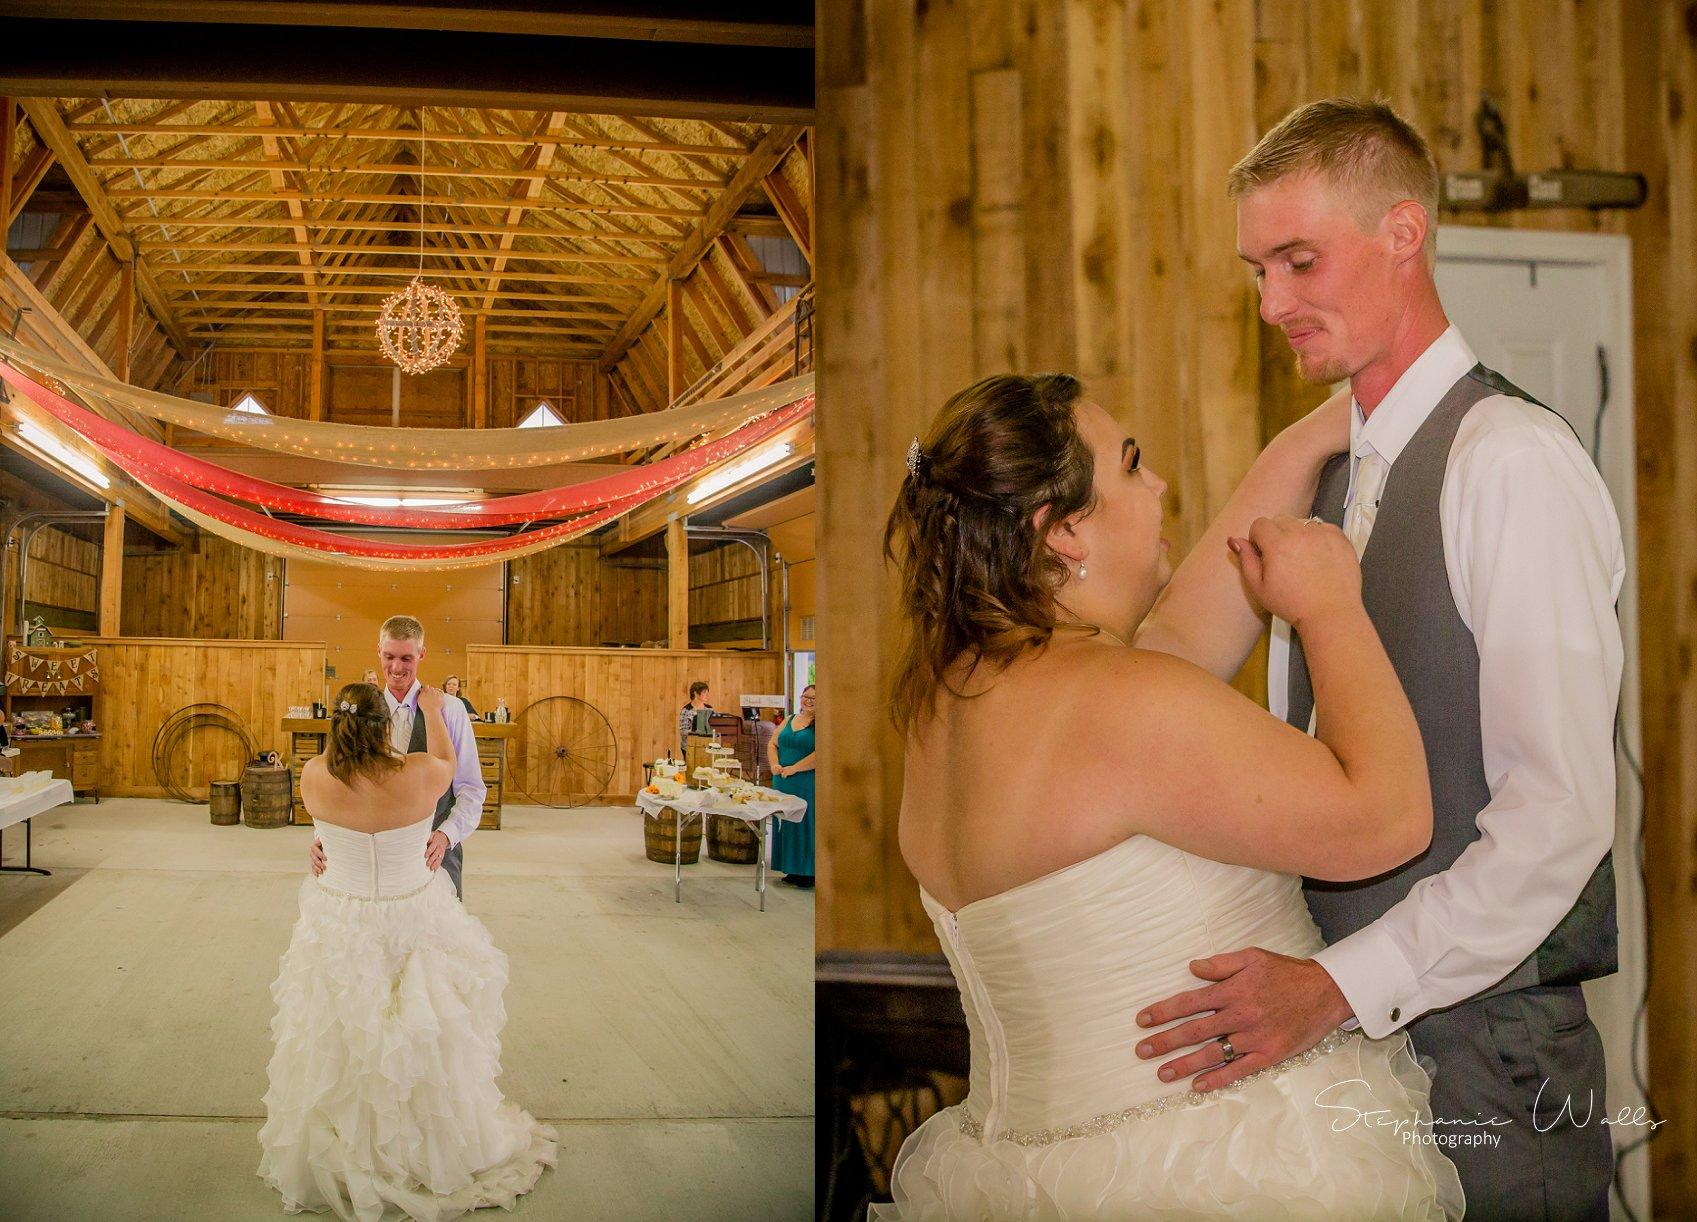 Kimble Wedding 004 1 Marlena & Allans | Snohomish Red Barn Events (Stocker Farms) | Snohomish, Wa Wedding Photographer